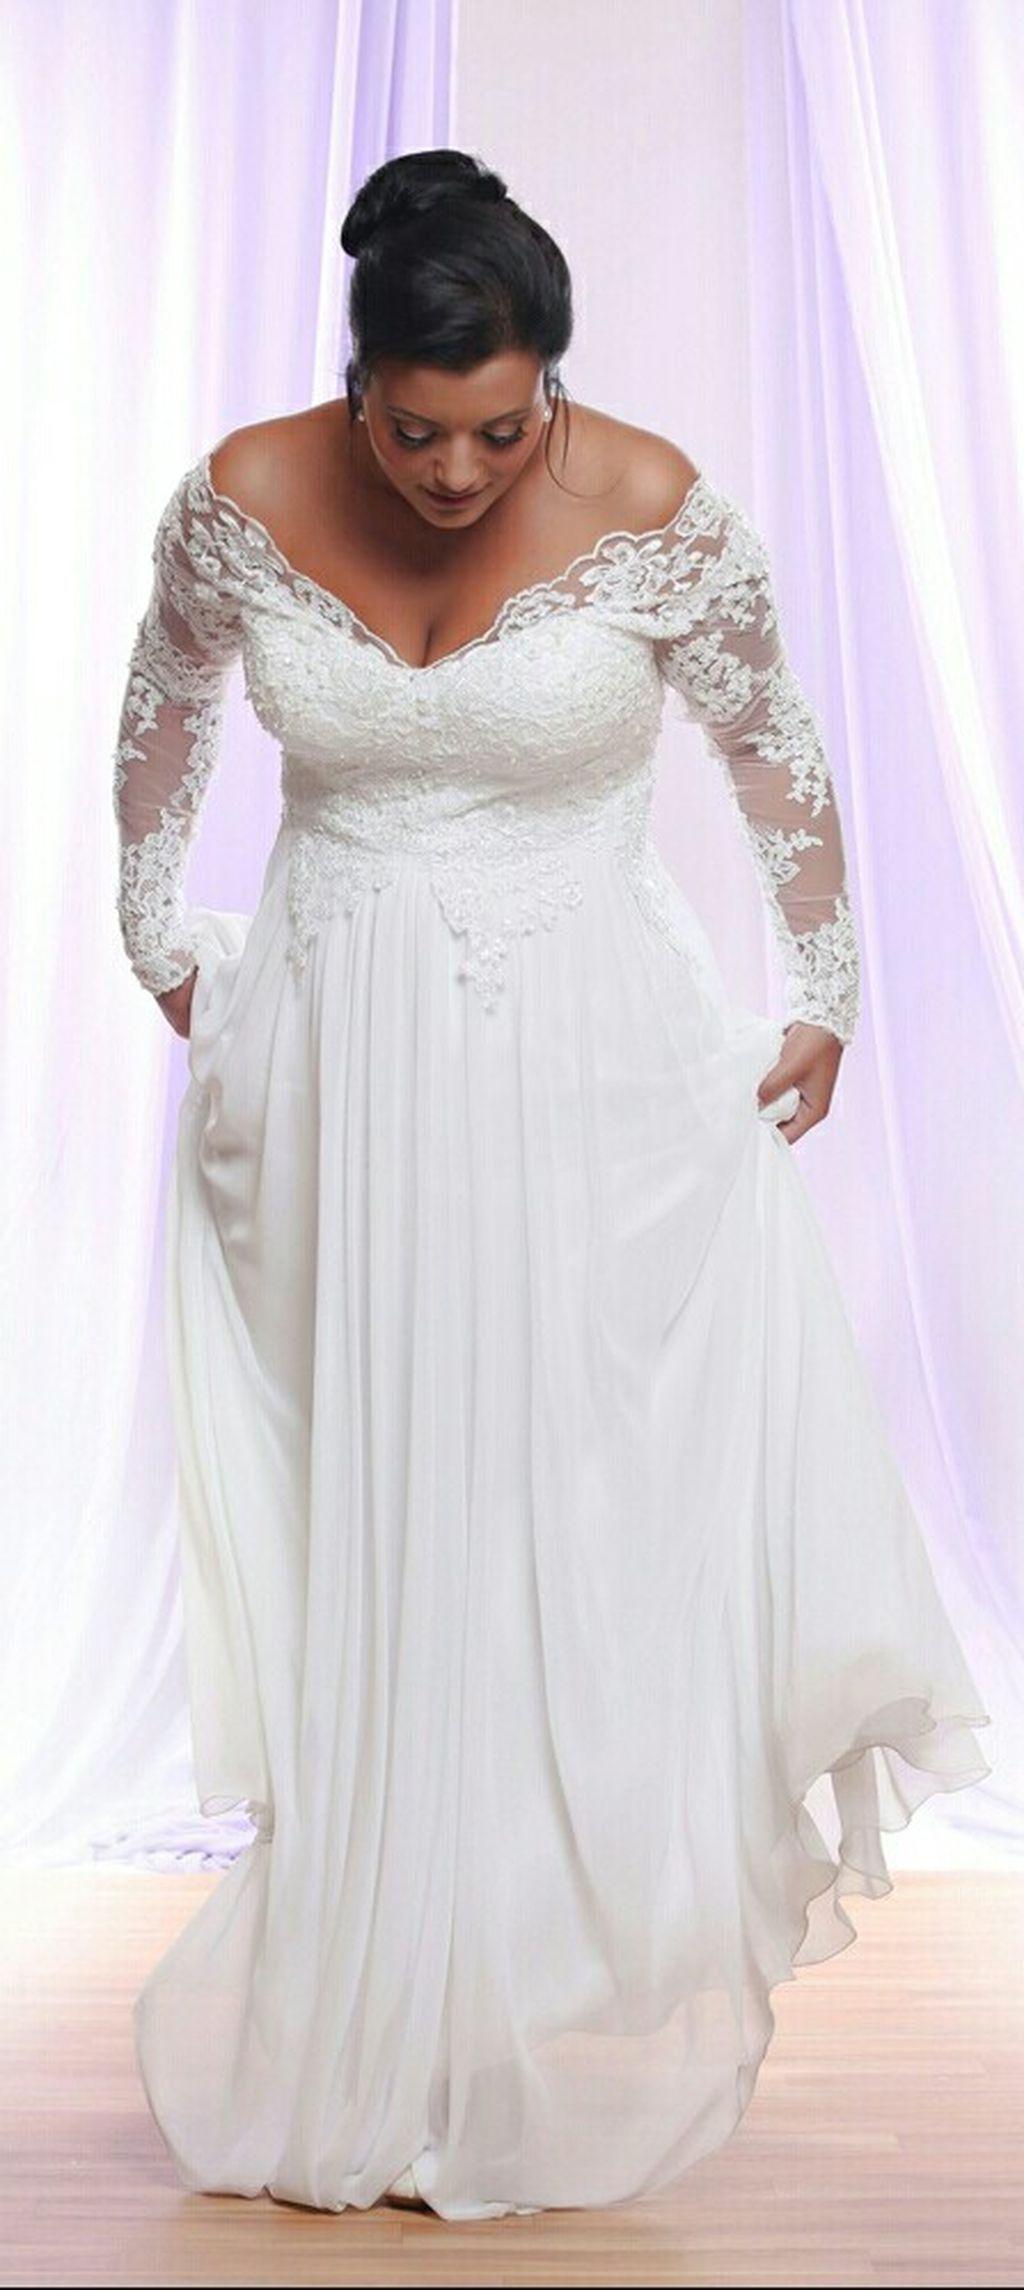 54 Stunning Plus Size Winter Wedding Dress Ideas with Lace | Dress ...